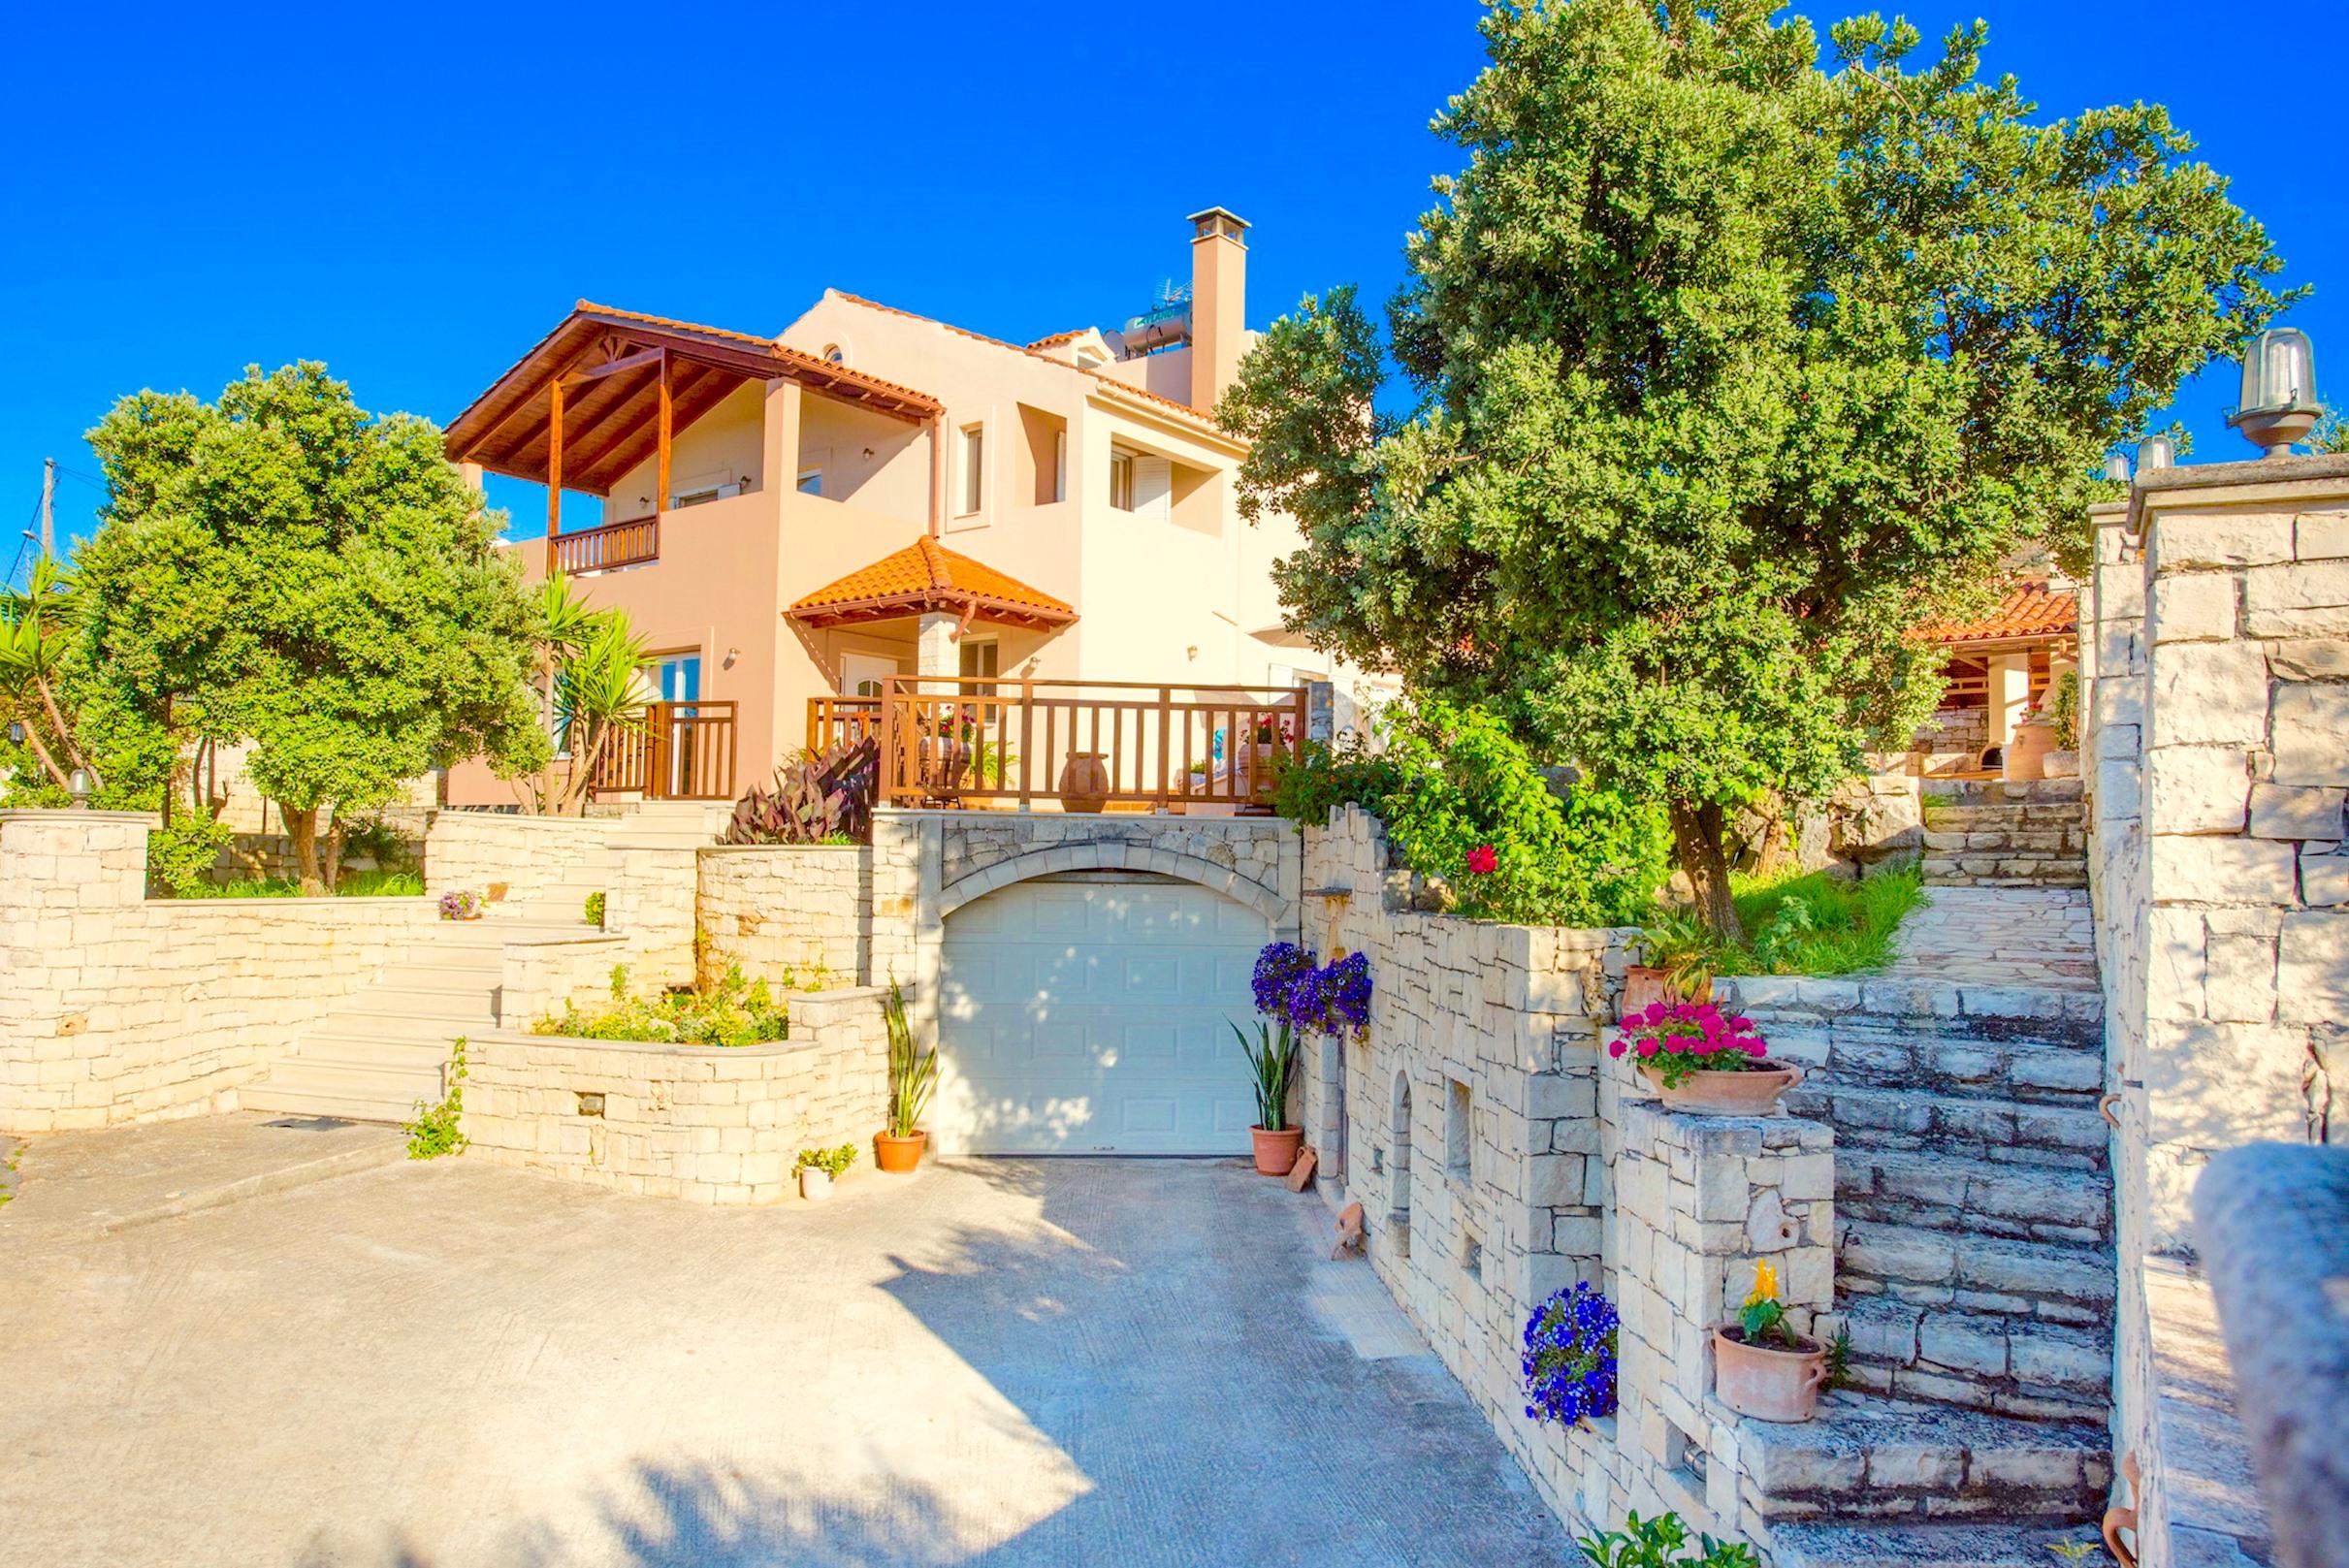 Ferienhaus Luxury Villa Korini with private swimming pool (2470495), Roumeli, Kreta Nordküste, Kreta, Griechenland, Bild 1